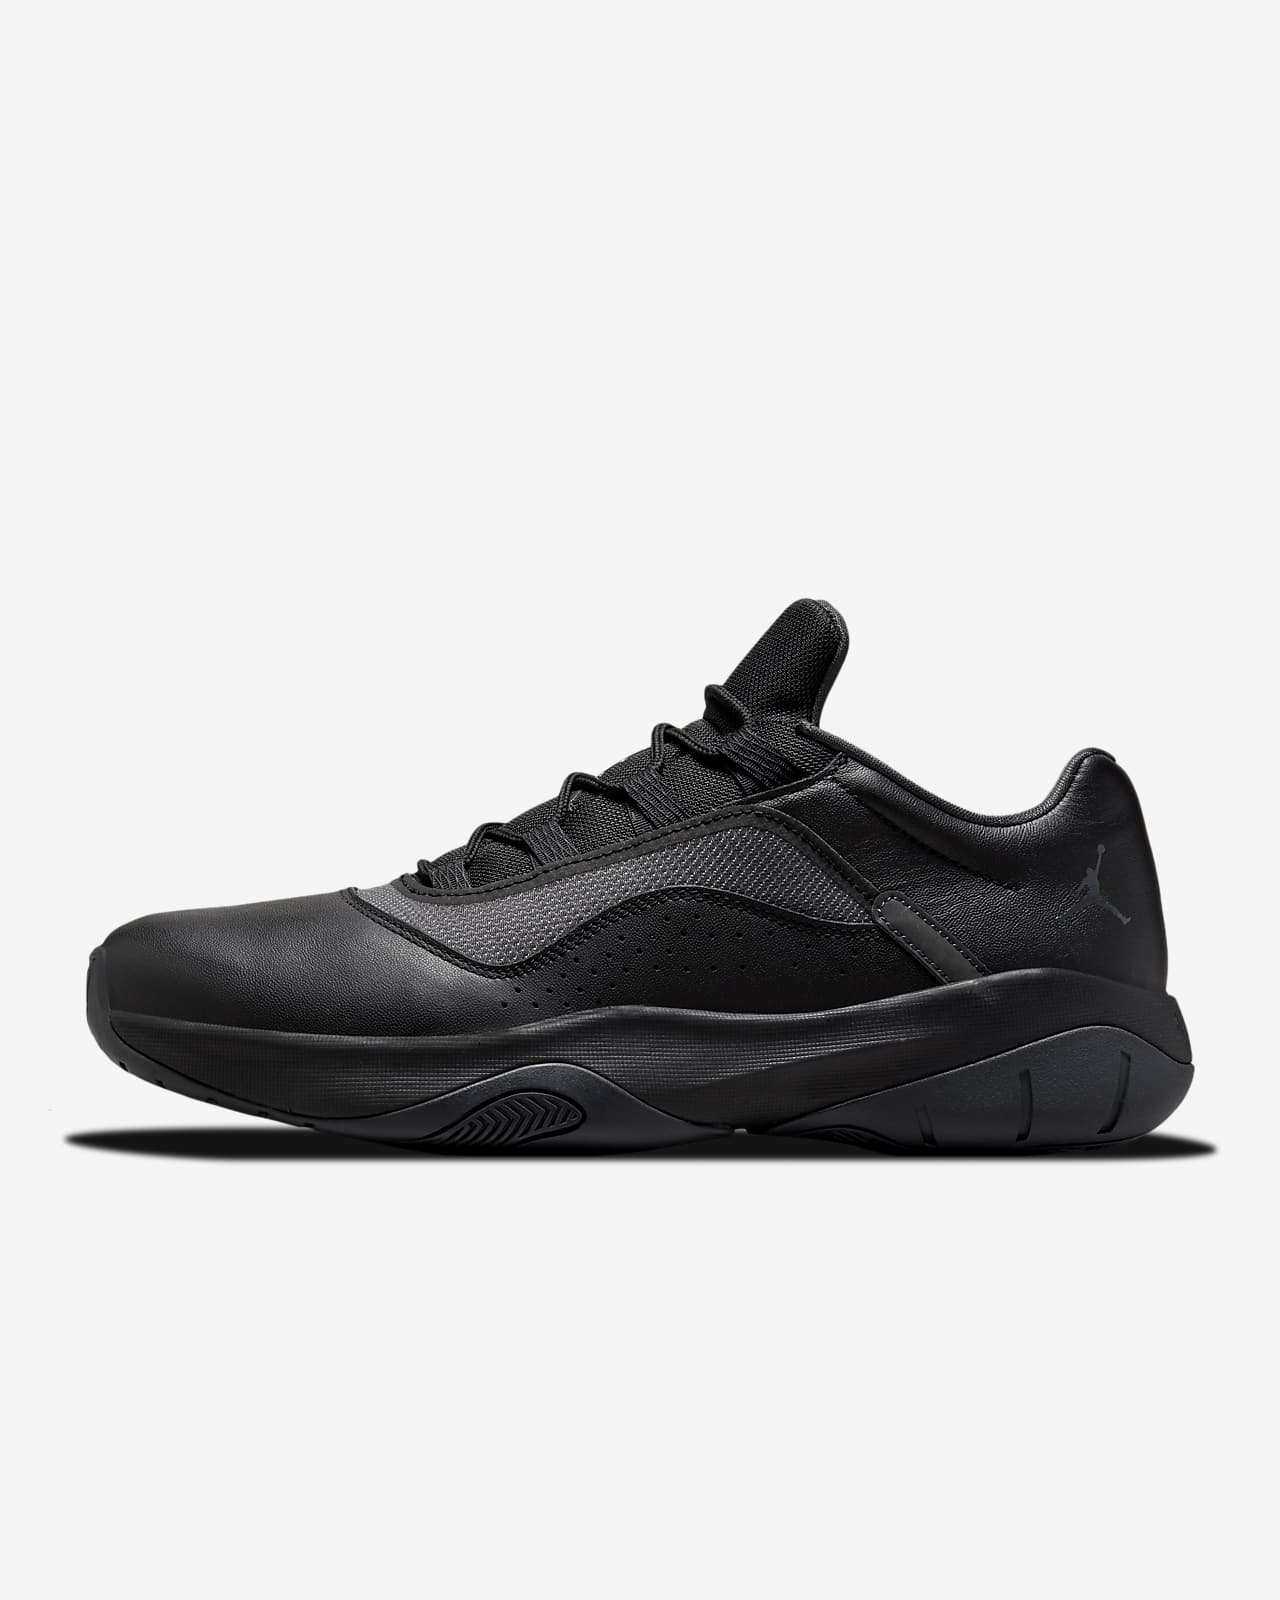 Air Jordan 11 CMFT Low Zapatillas - Hombre